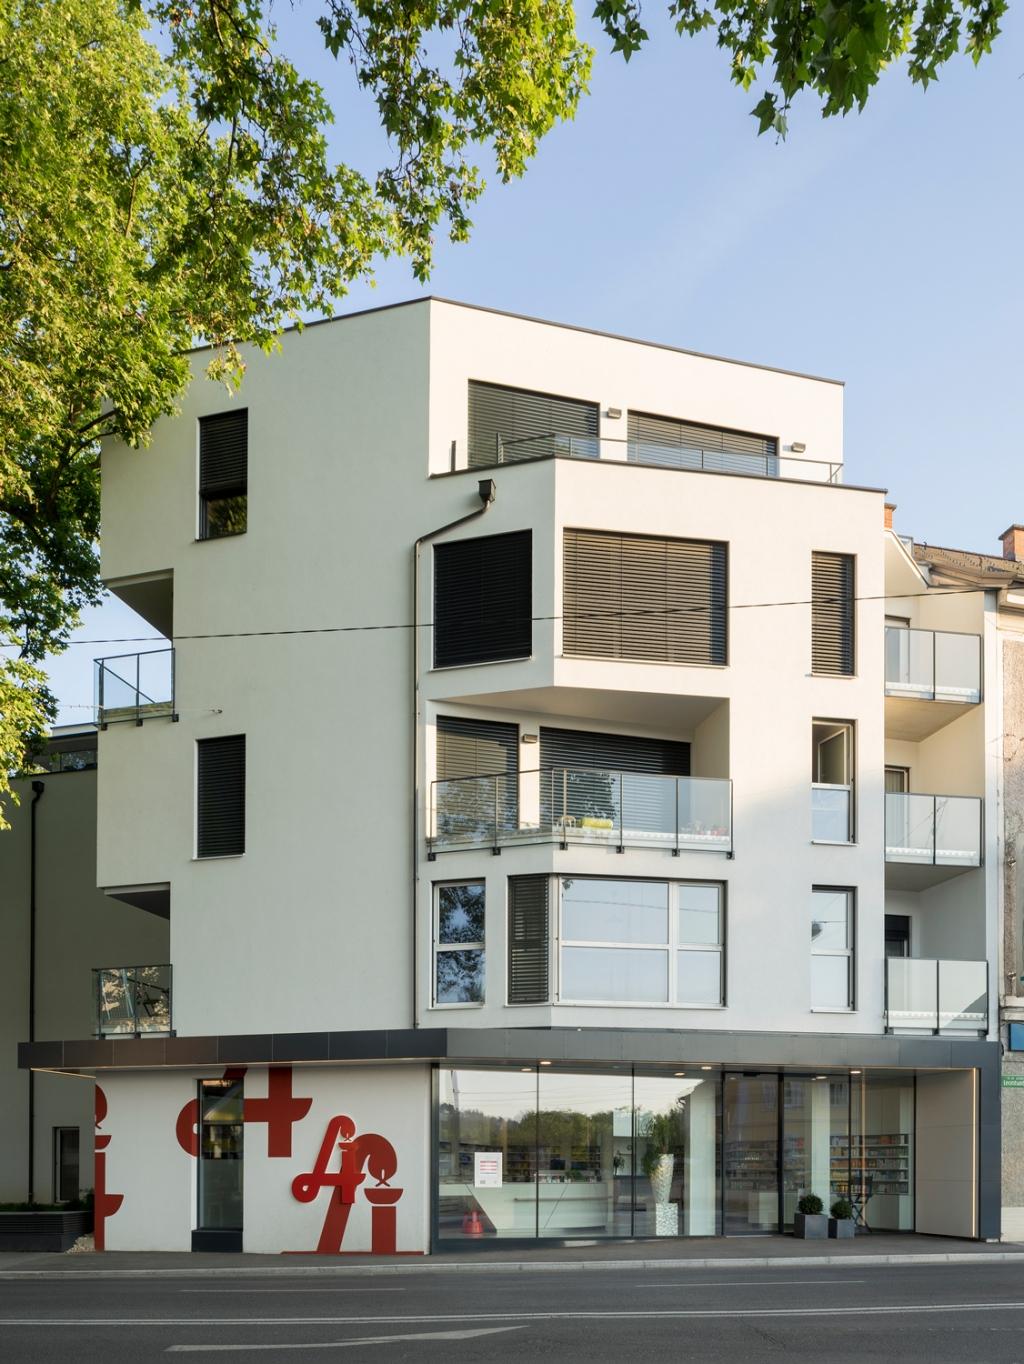 MAXIMILIAN HAIDACHER / PHOTOGRAPHY Apotheke L, Graz